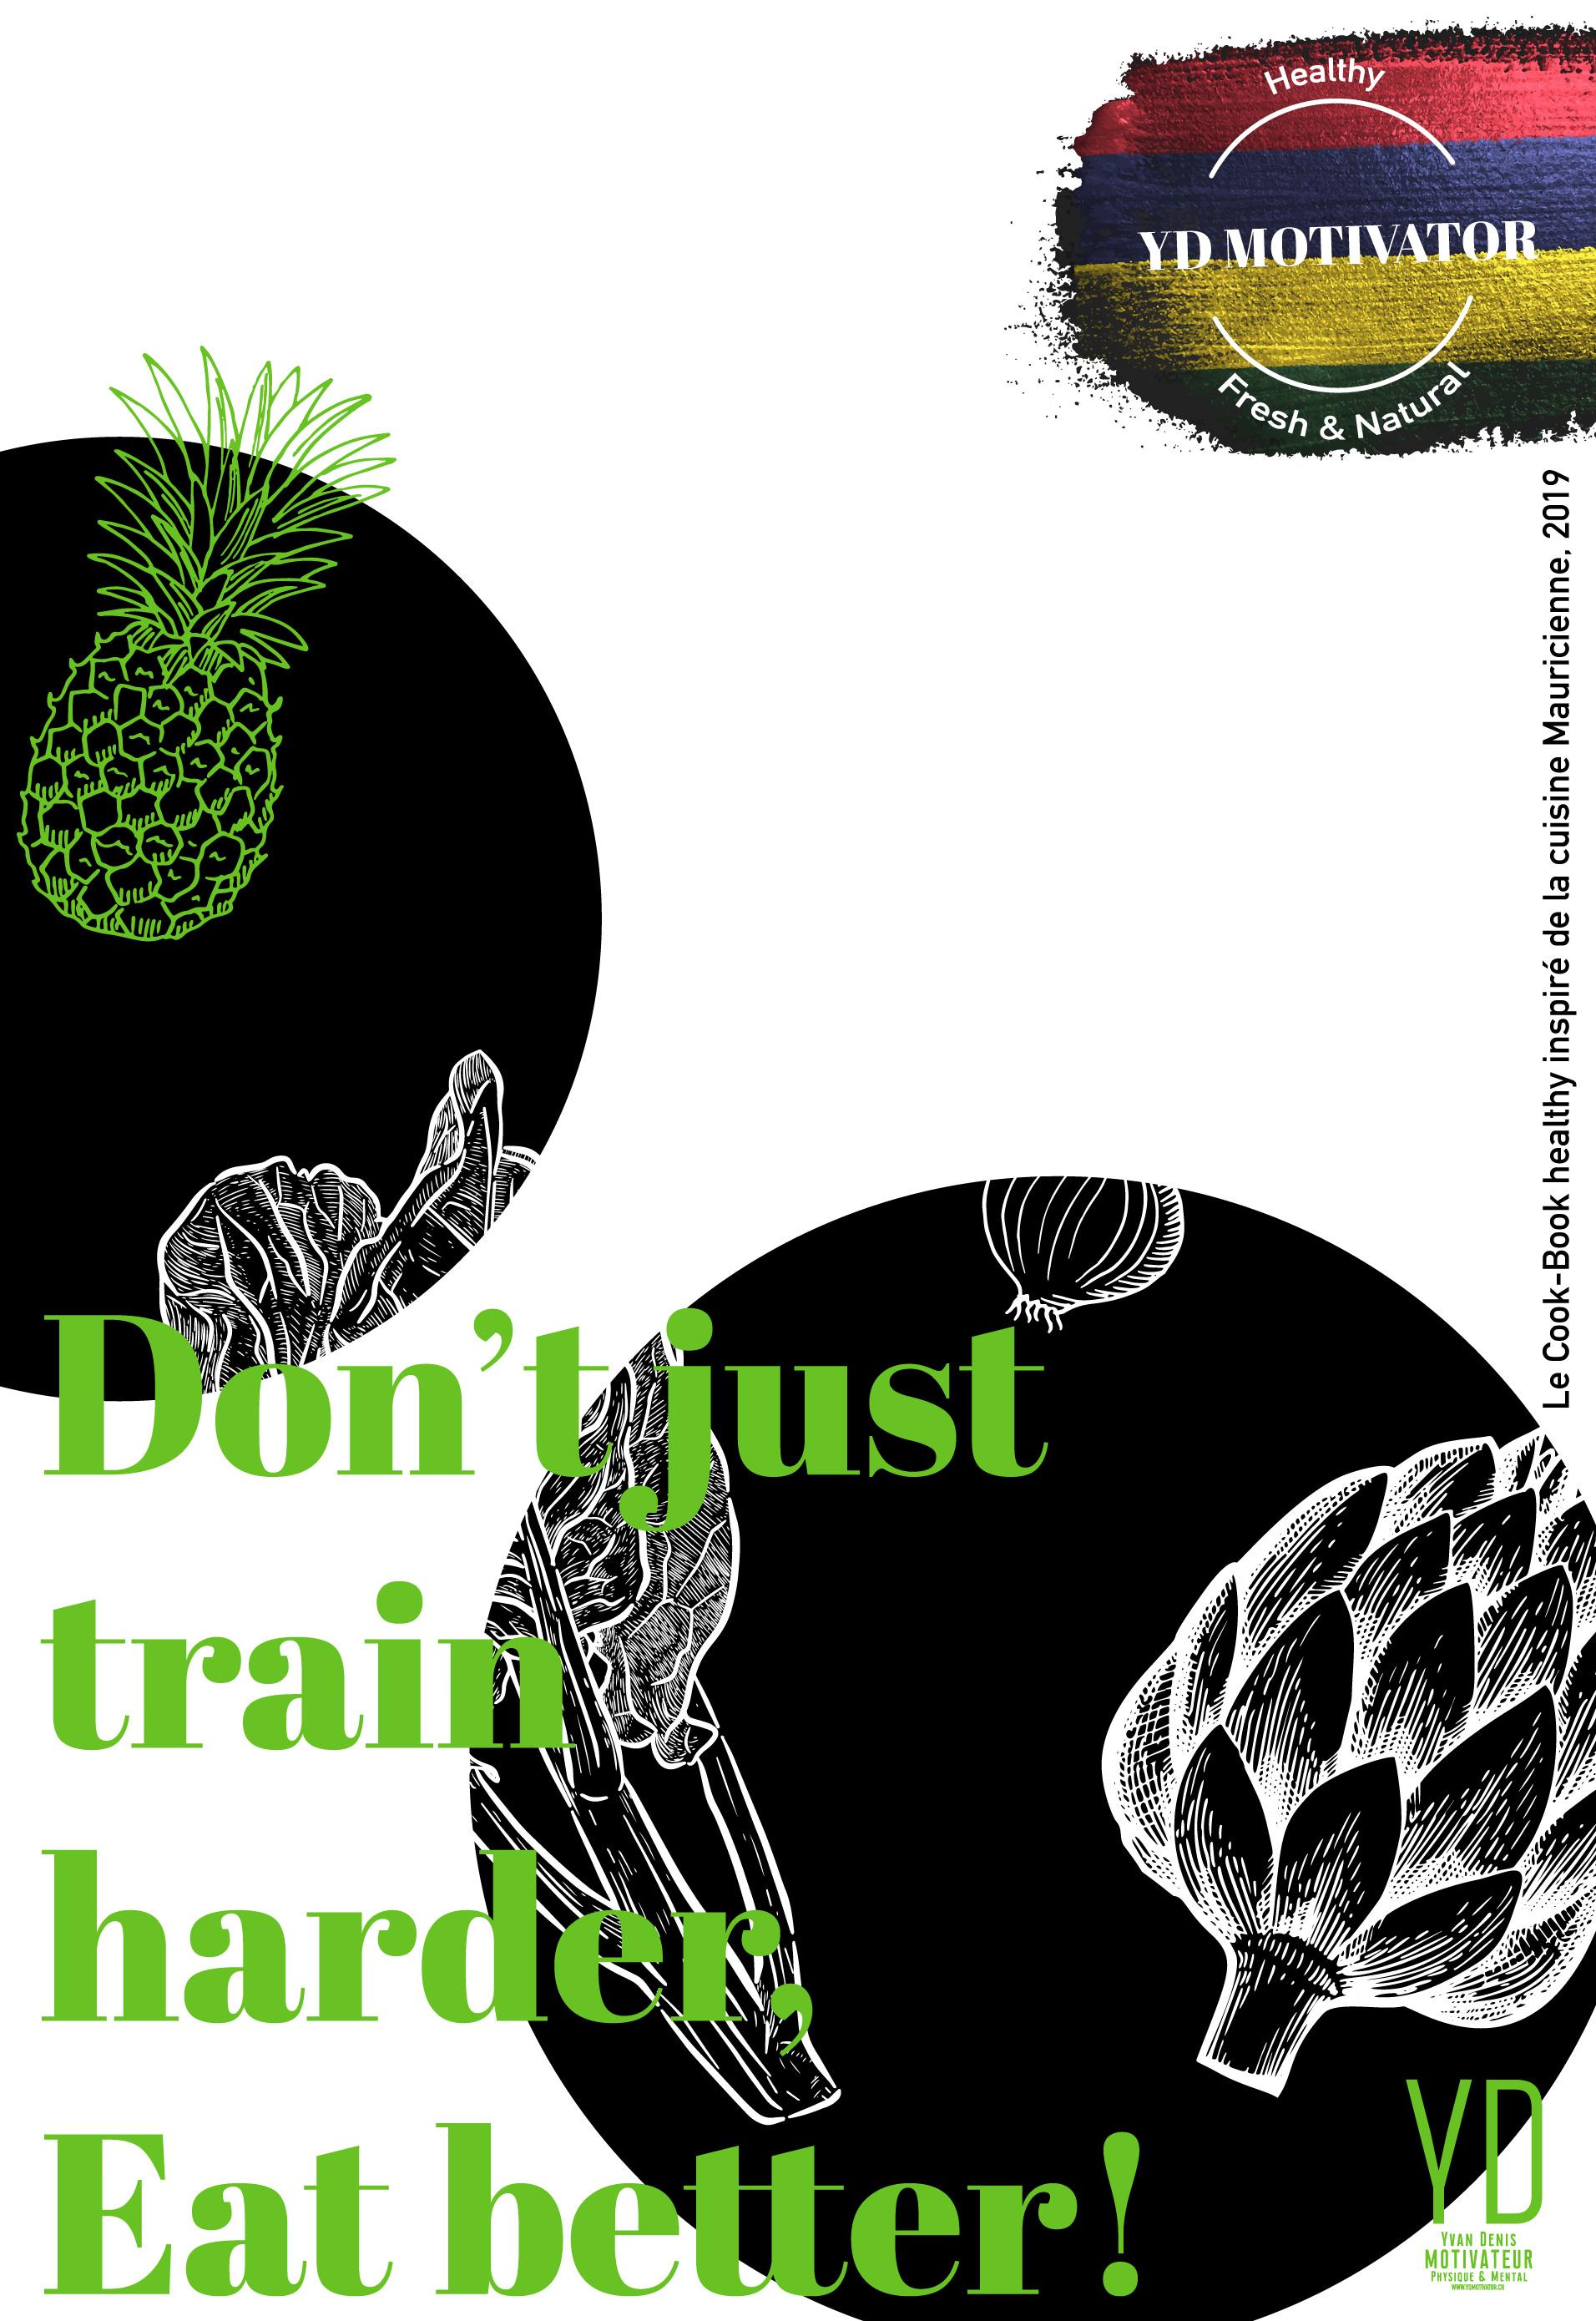 YVAN_DENIS_COOK_BOOK_NEW_COVER.jpg